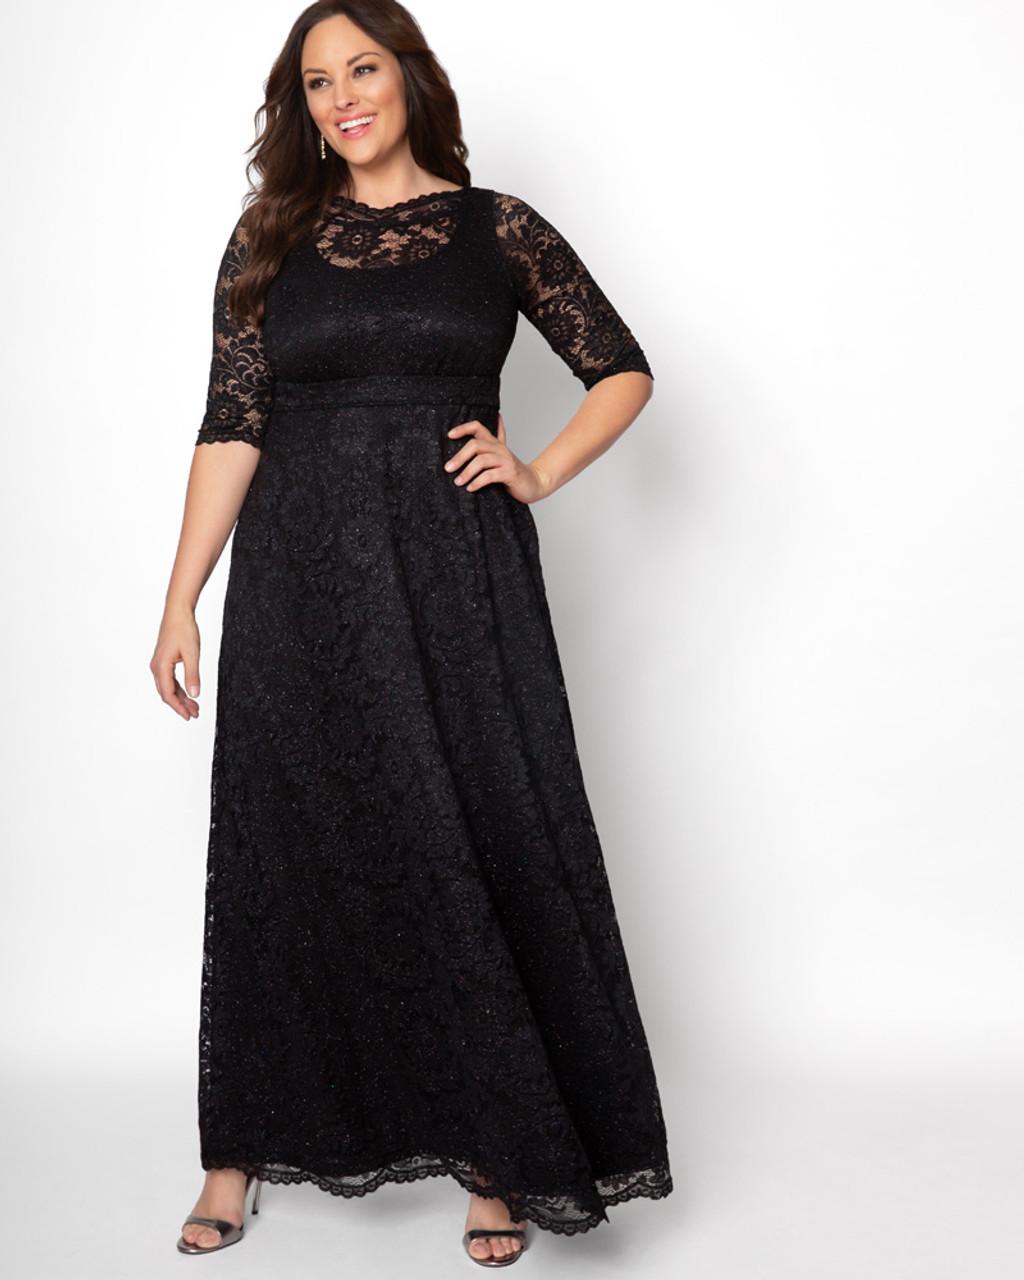 Kiyonna Women\'s Plus Size Leona Lace Glitter Gown~Black*13180910